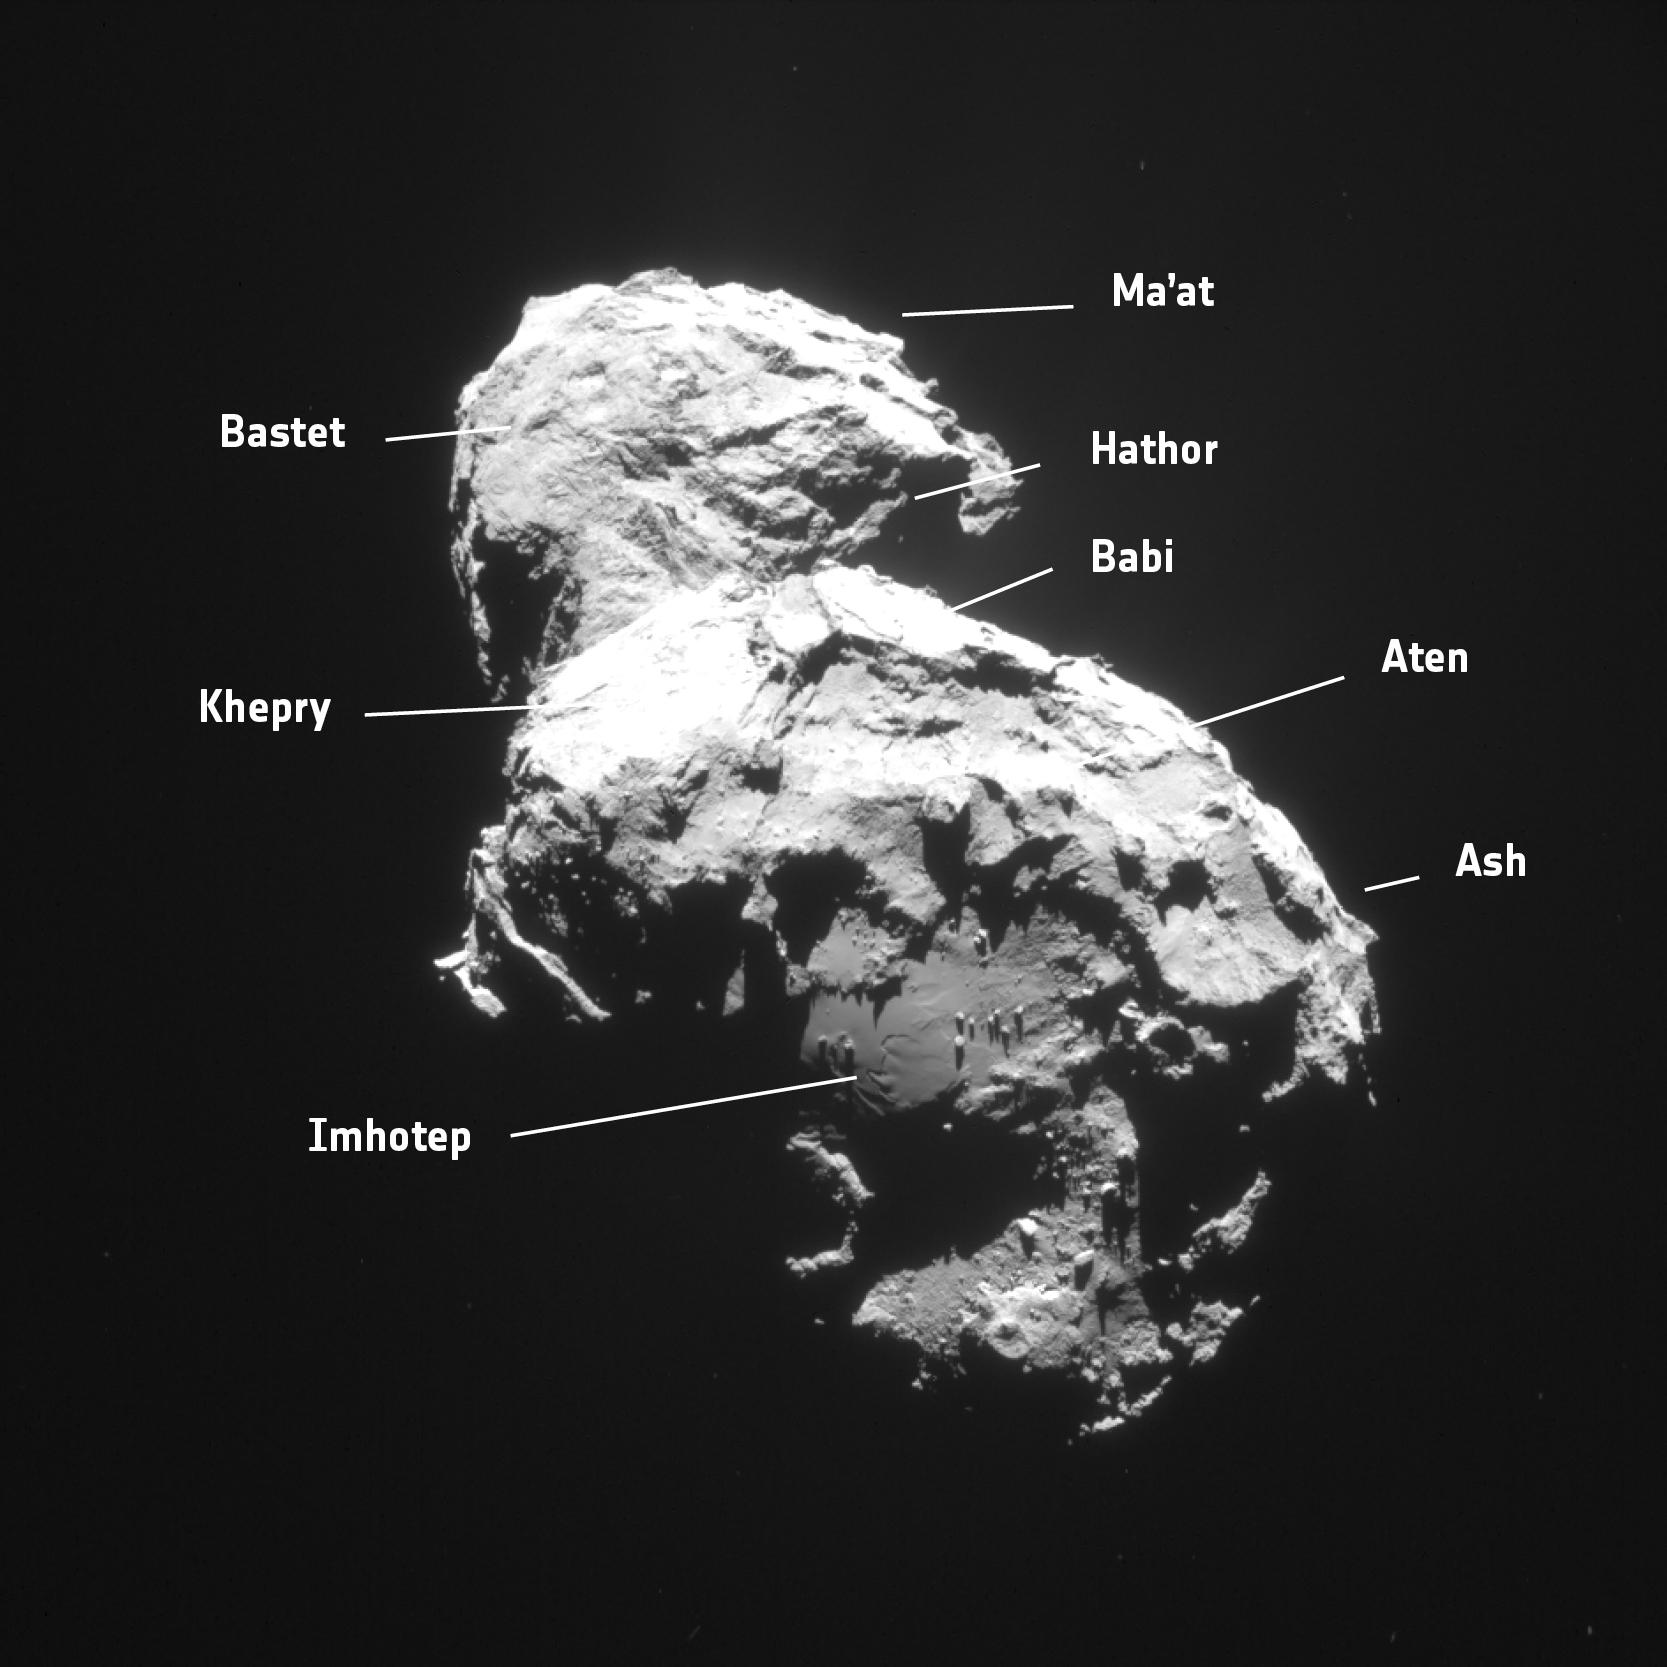 ESA_Rosetta_NAVCAM